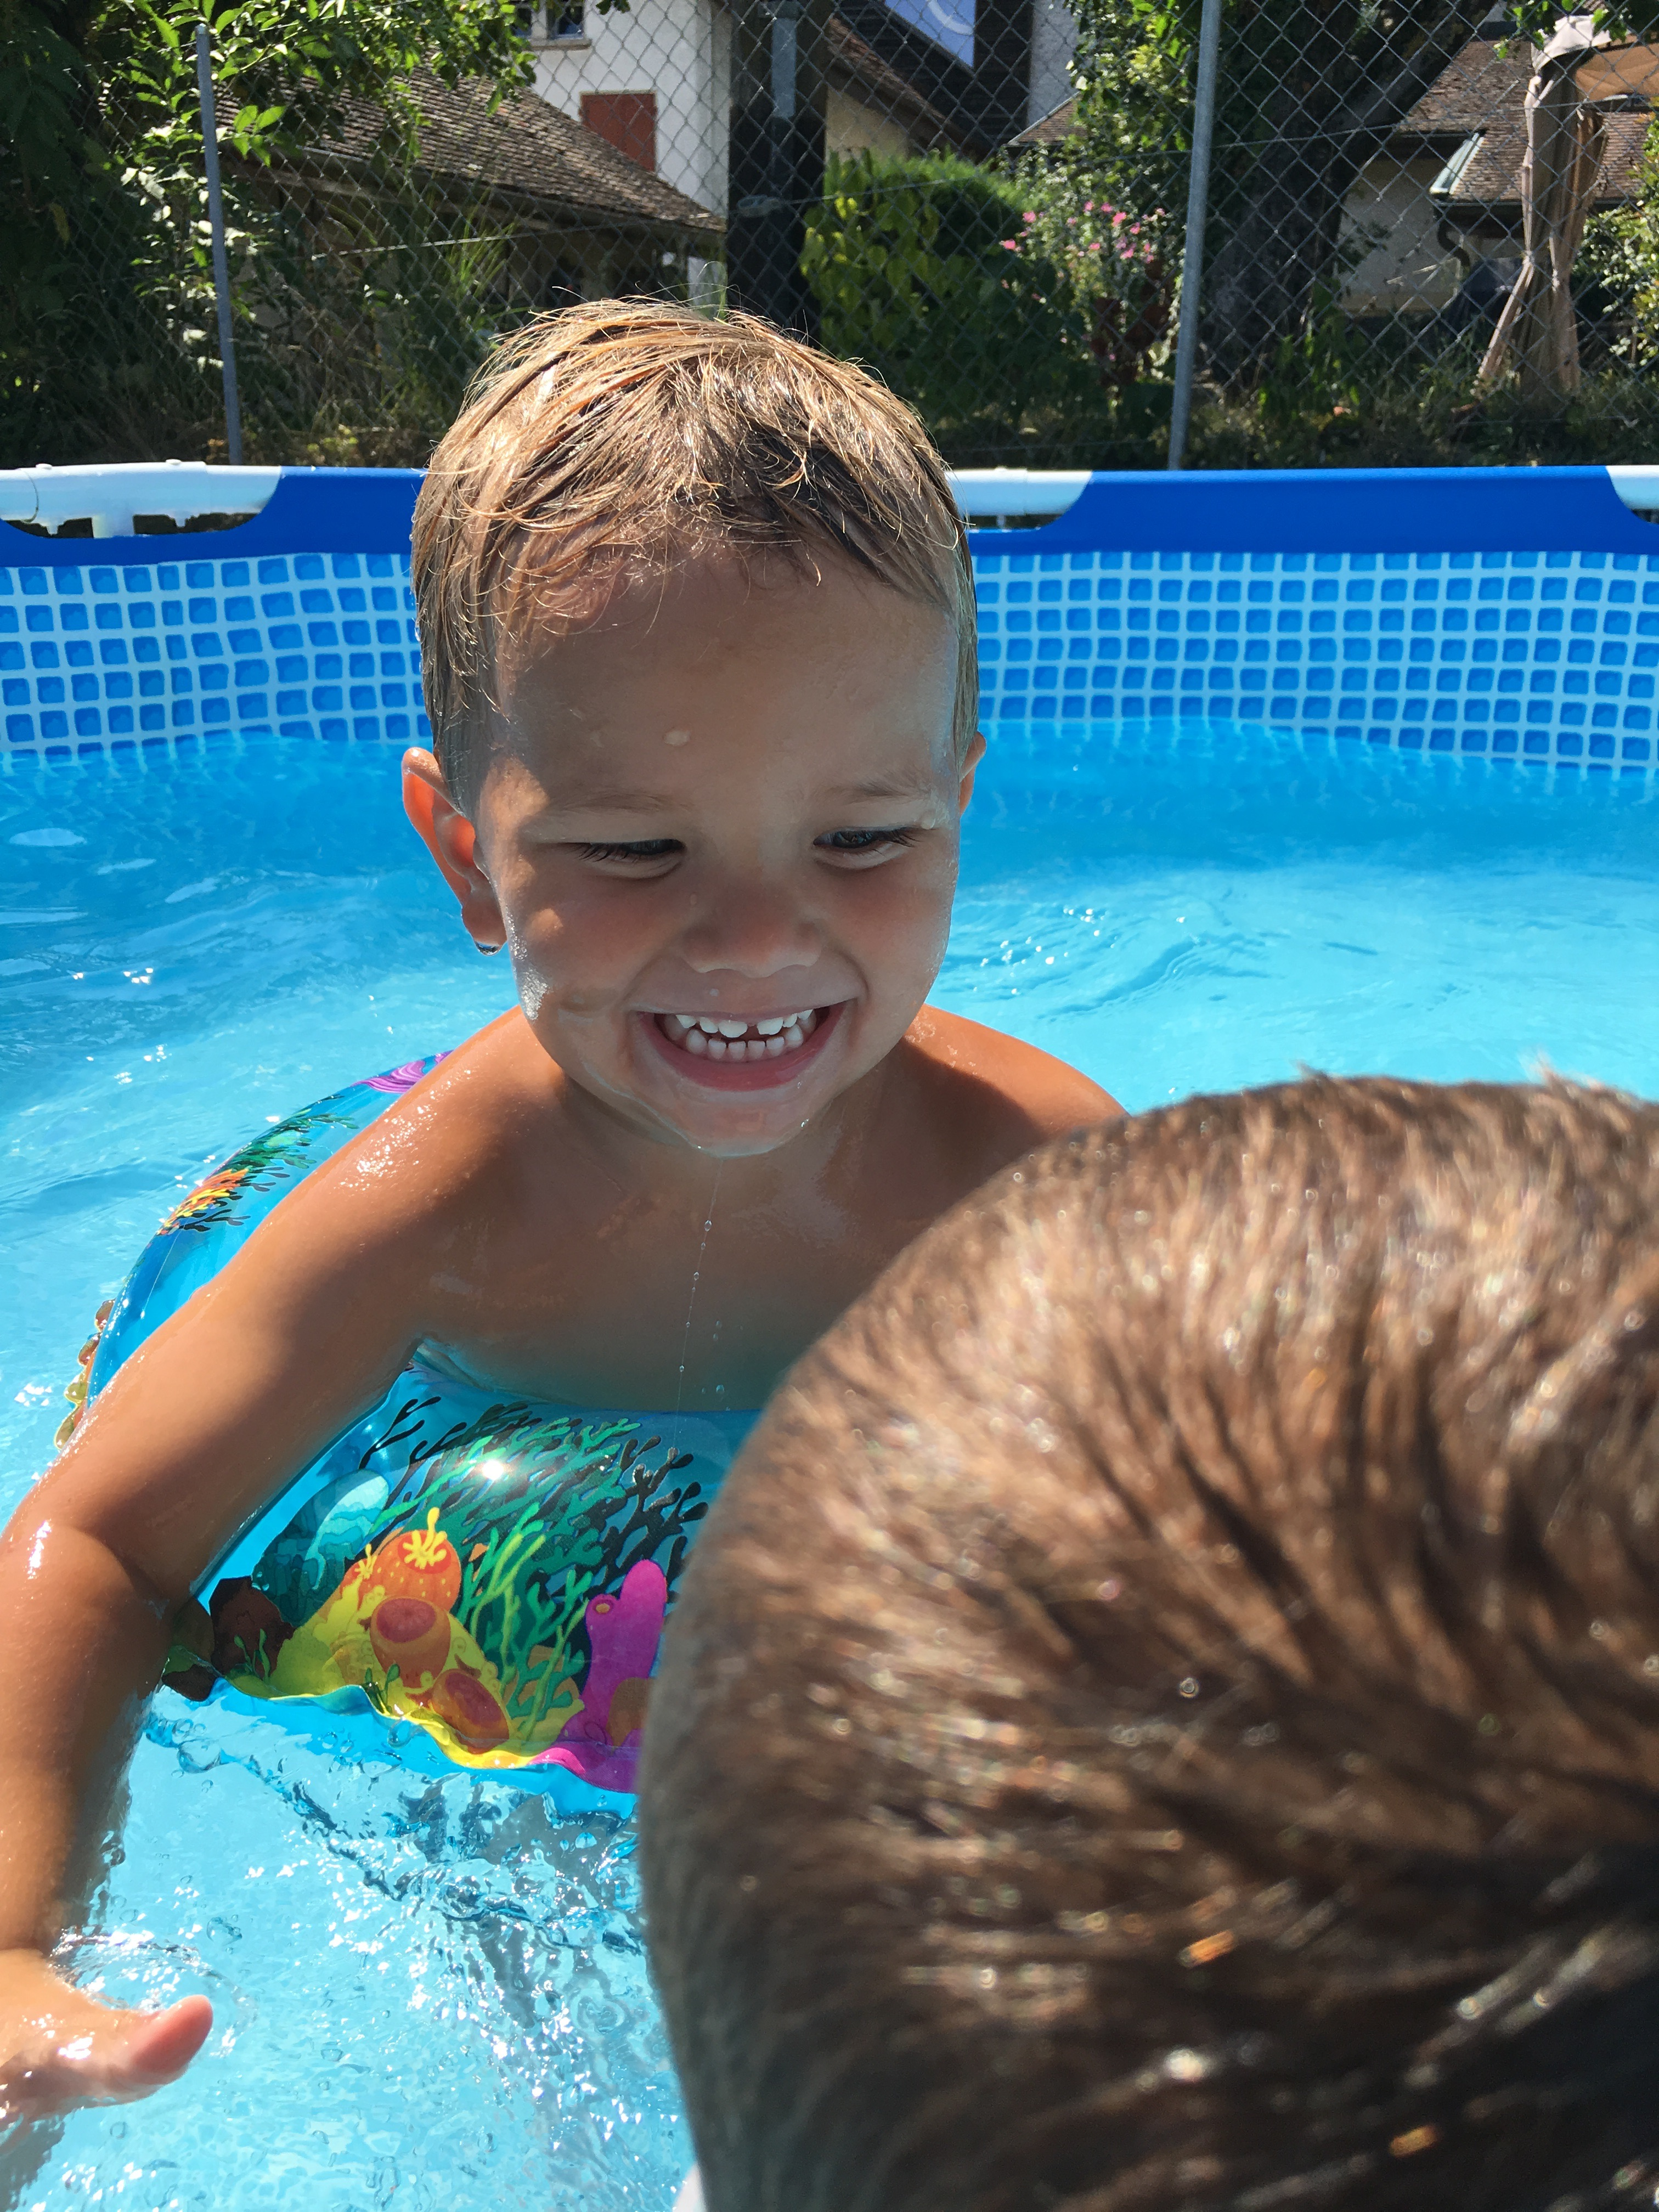 piscine intex marina landi blog suisse thereseandthekids famille